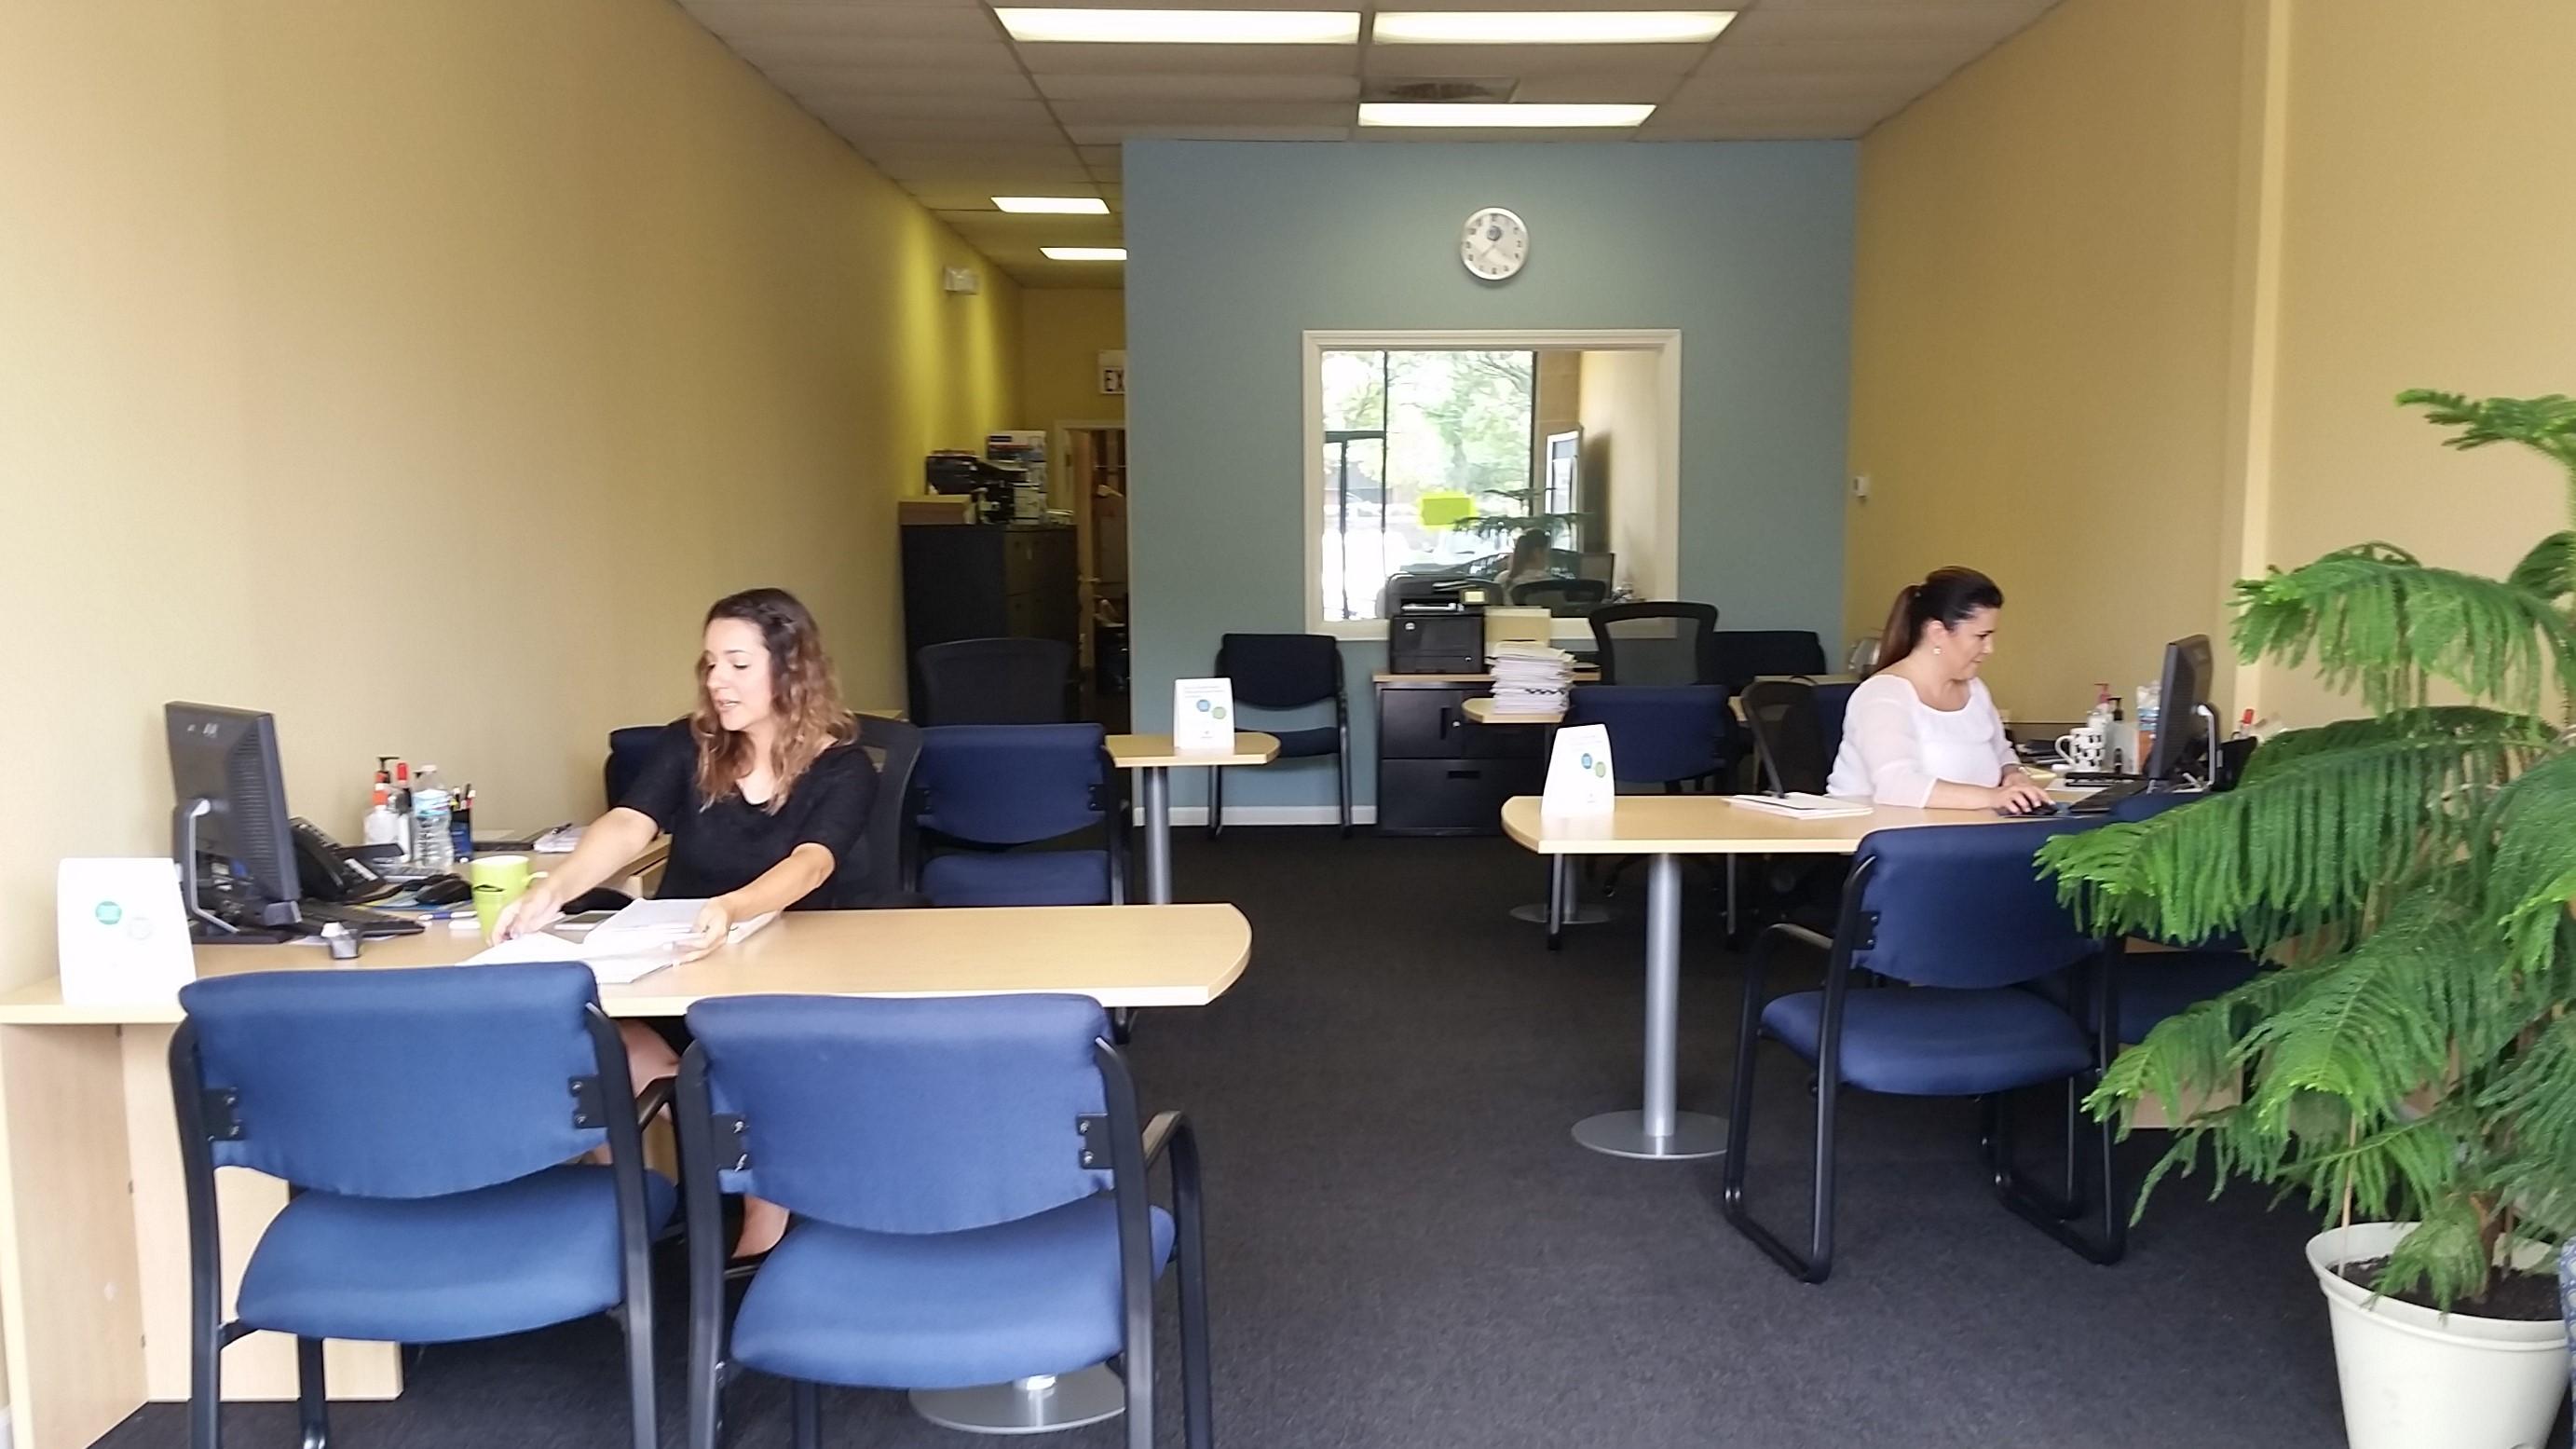 Arlington Heights Insurance Group, Inc.: Allstate Insurance image 4